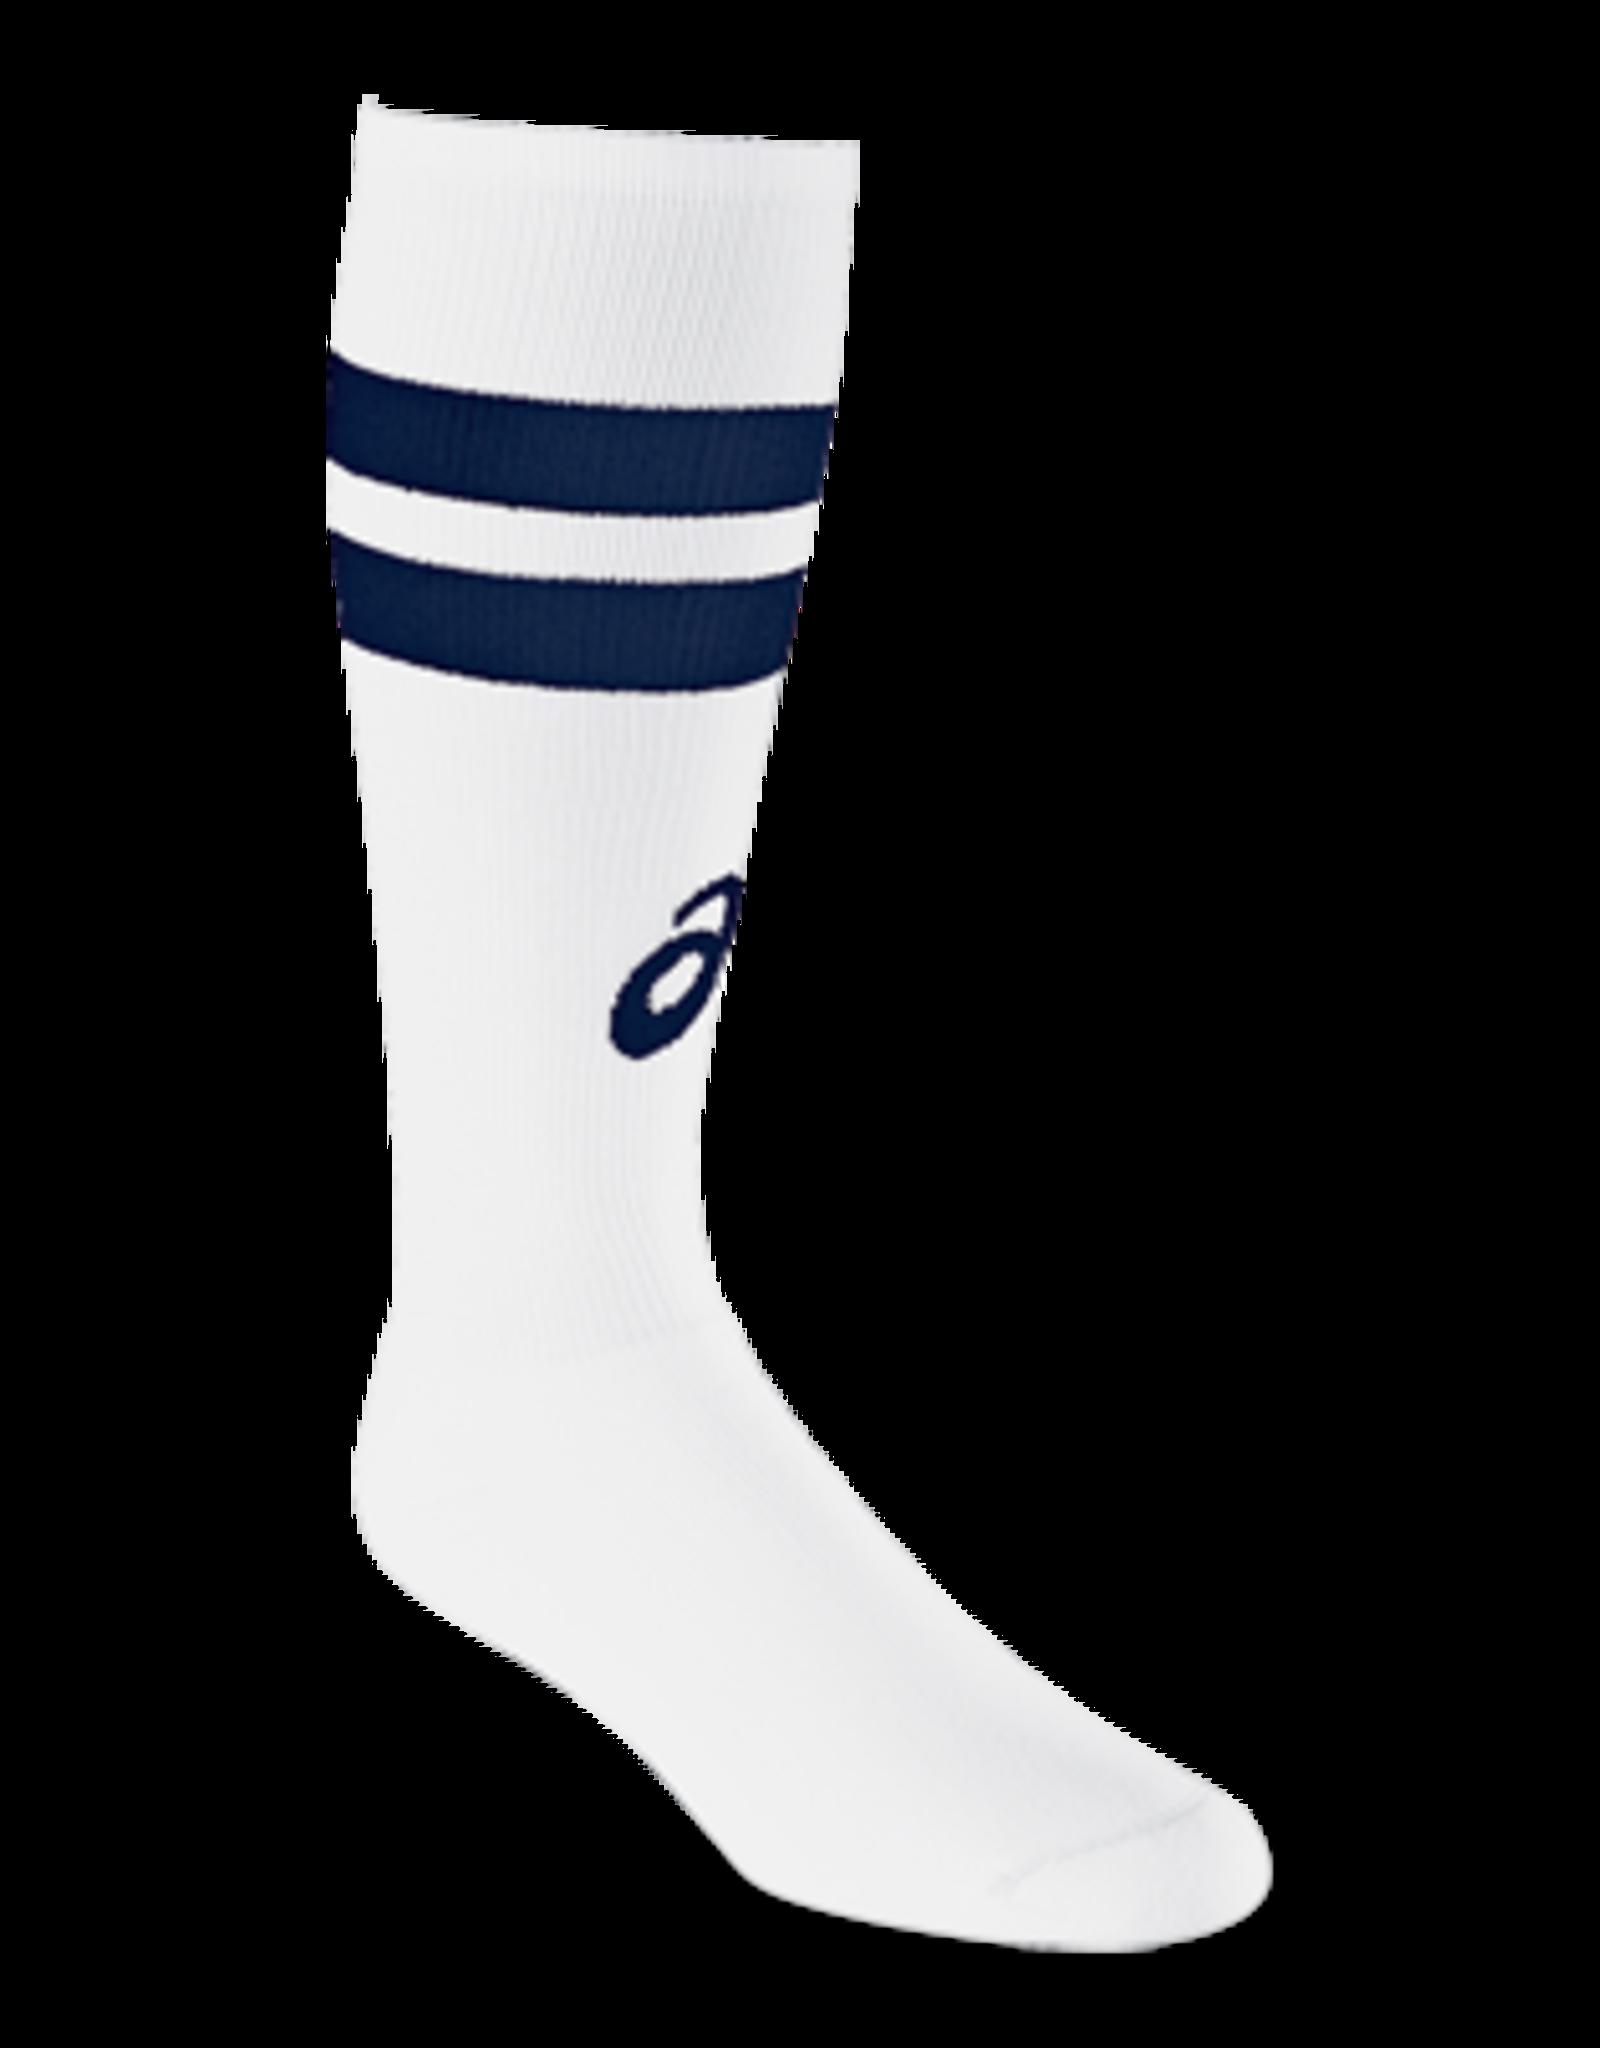 ASICS Old School Knee High Socks